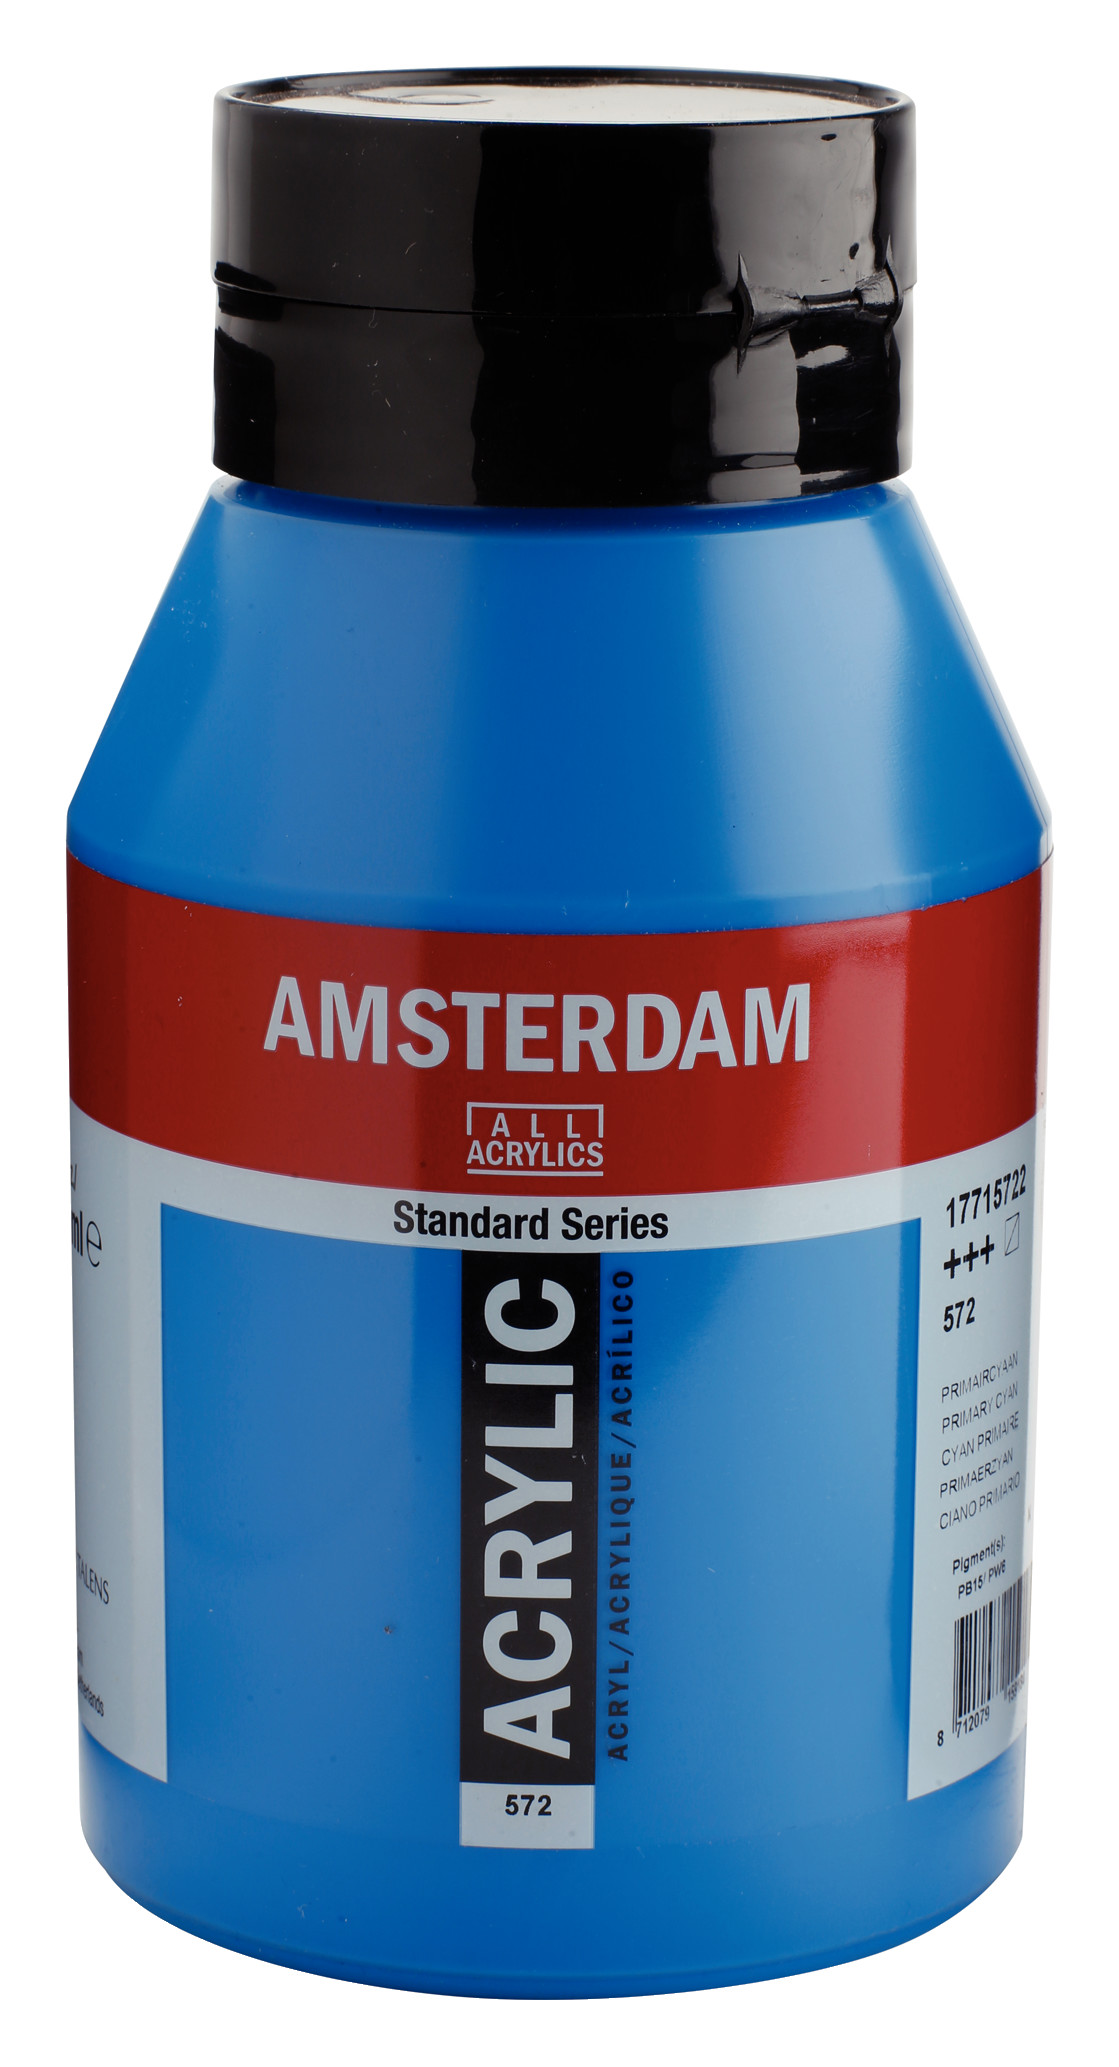 Amsterdam Standard Series Acrylic Jar 1000 ml Primary cyan 572